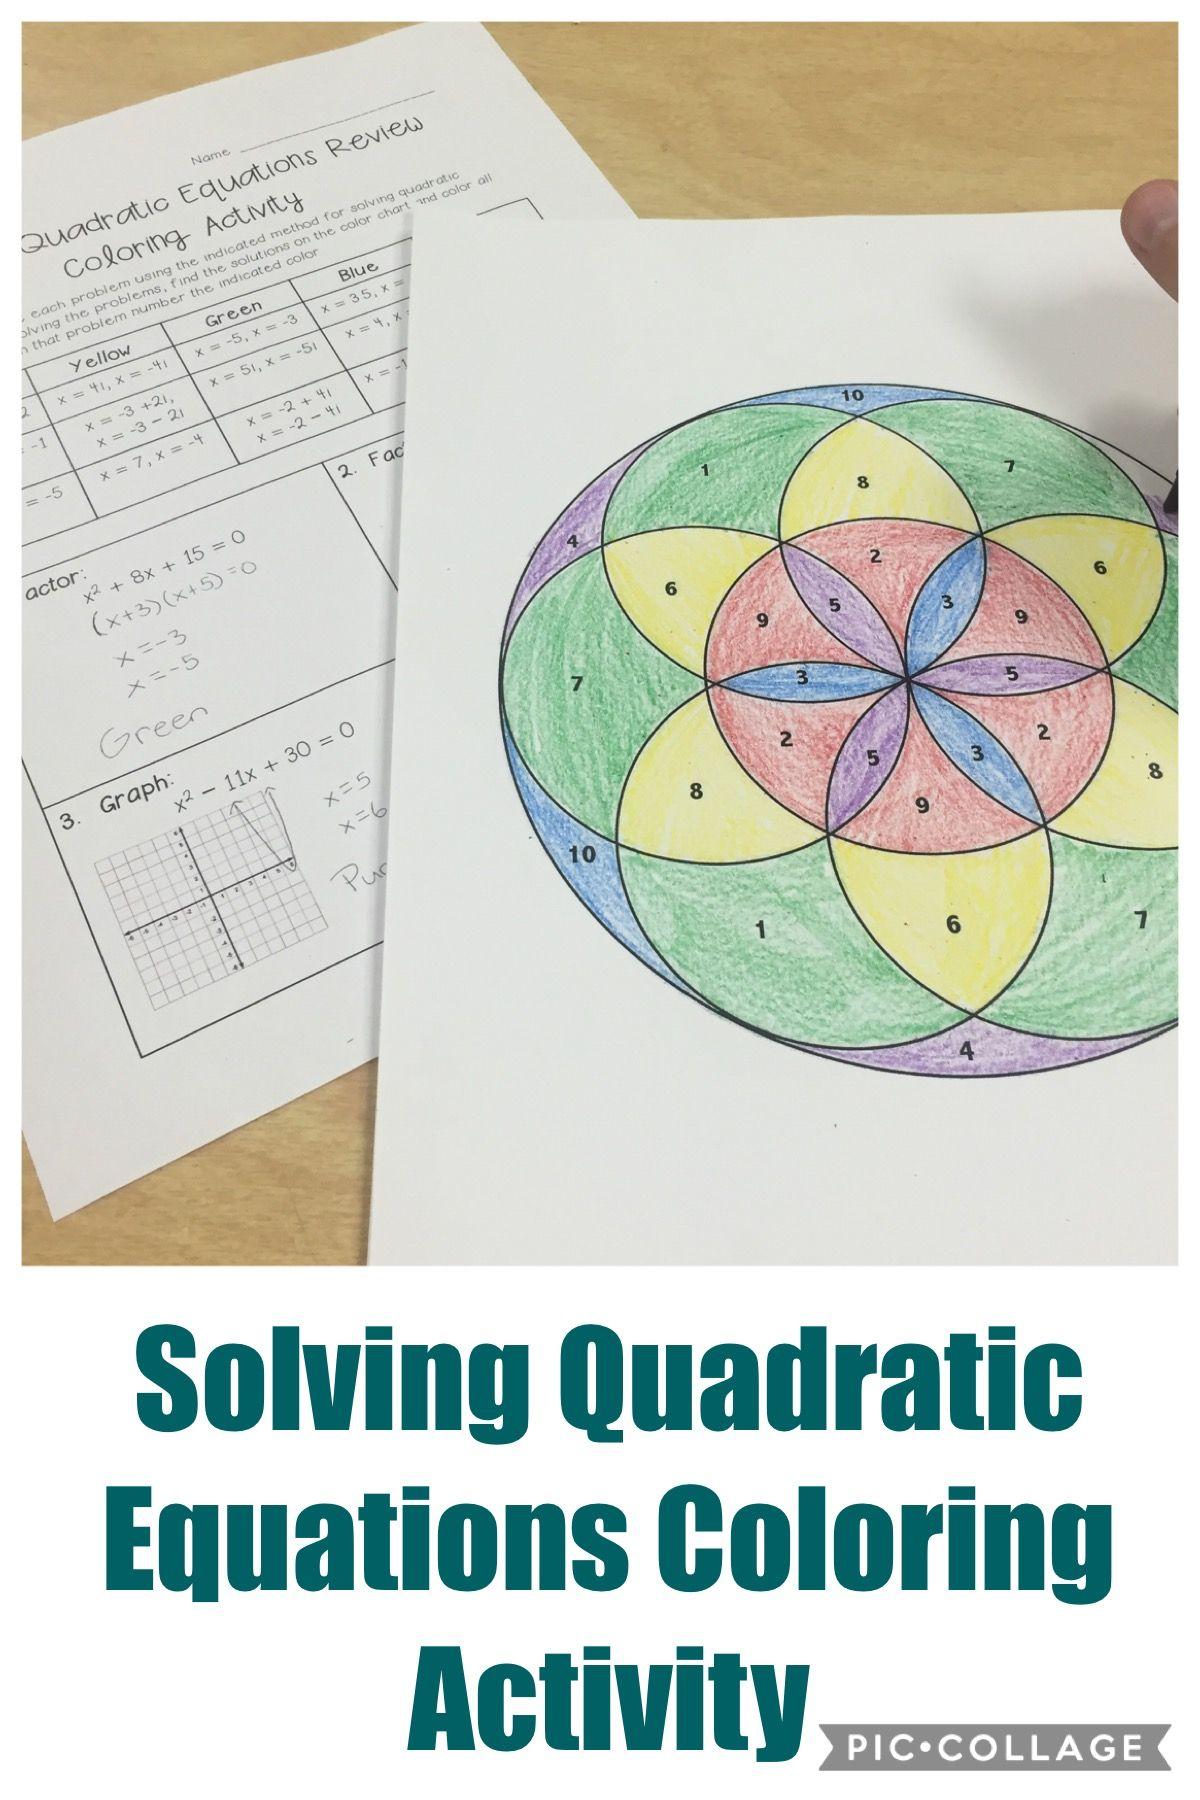 Solving Quadratic Equations Review Coloring Activity ...